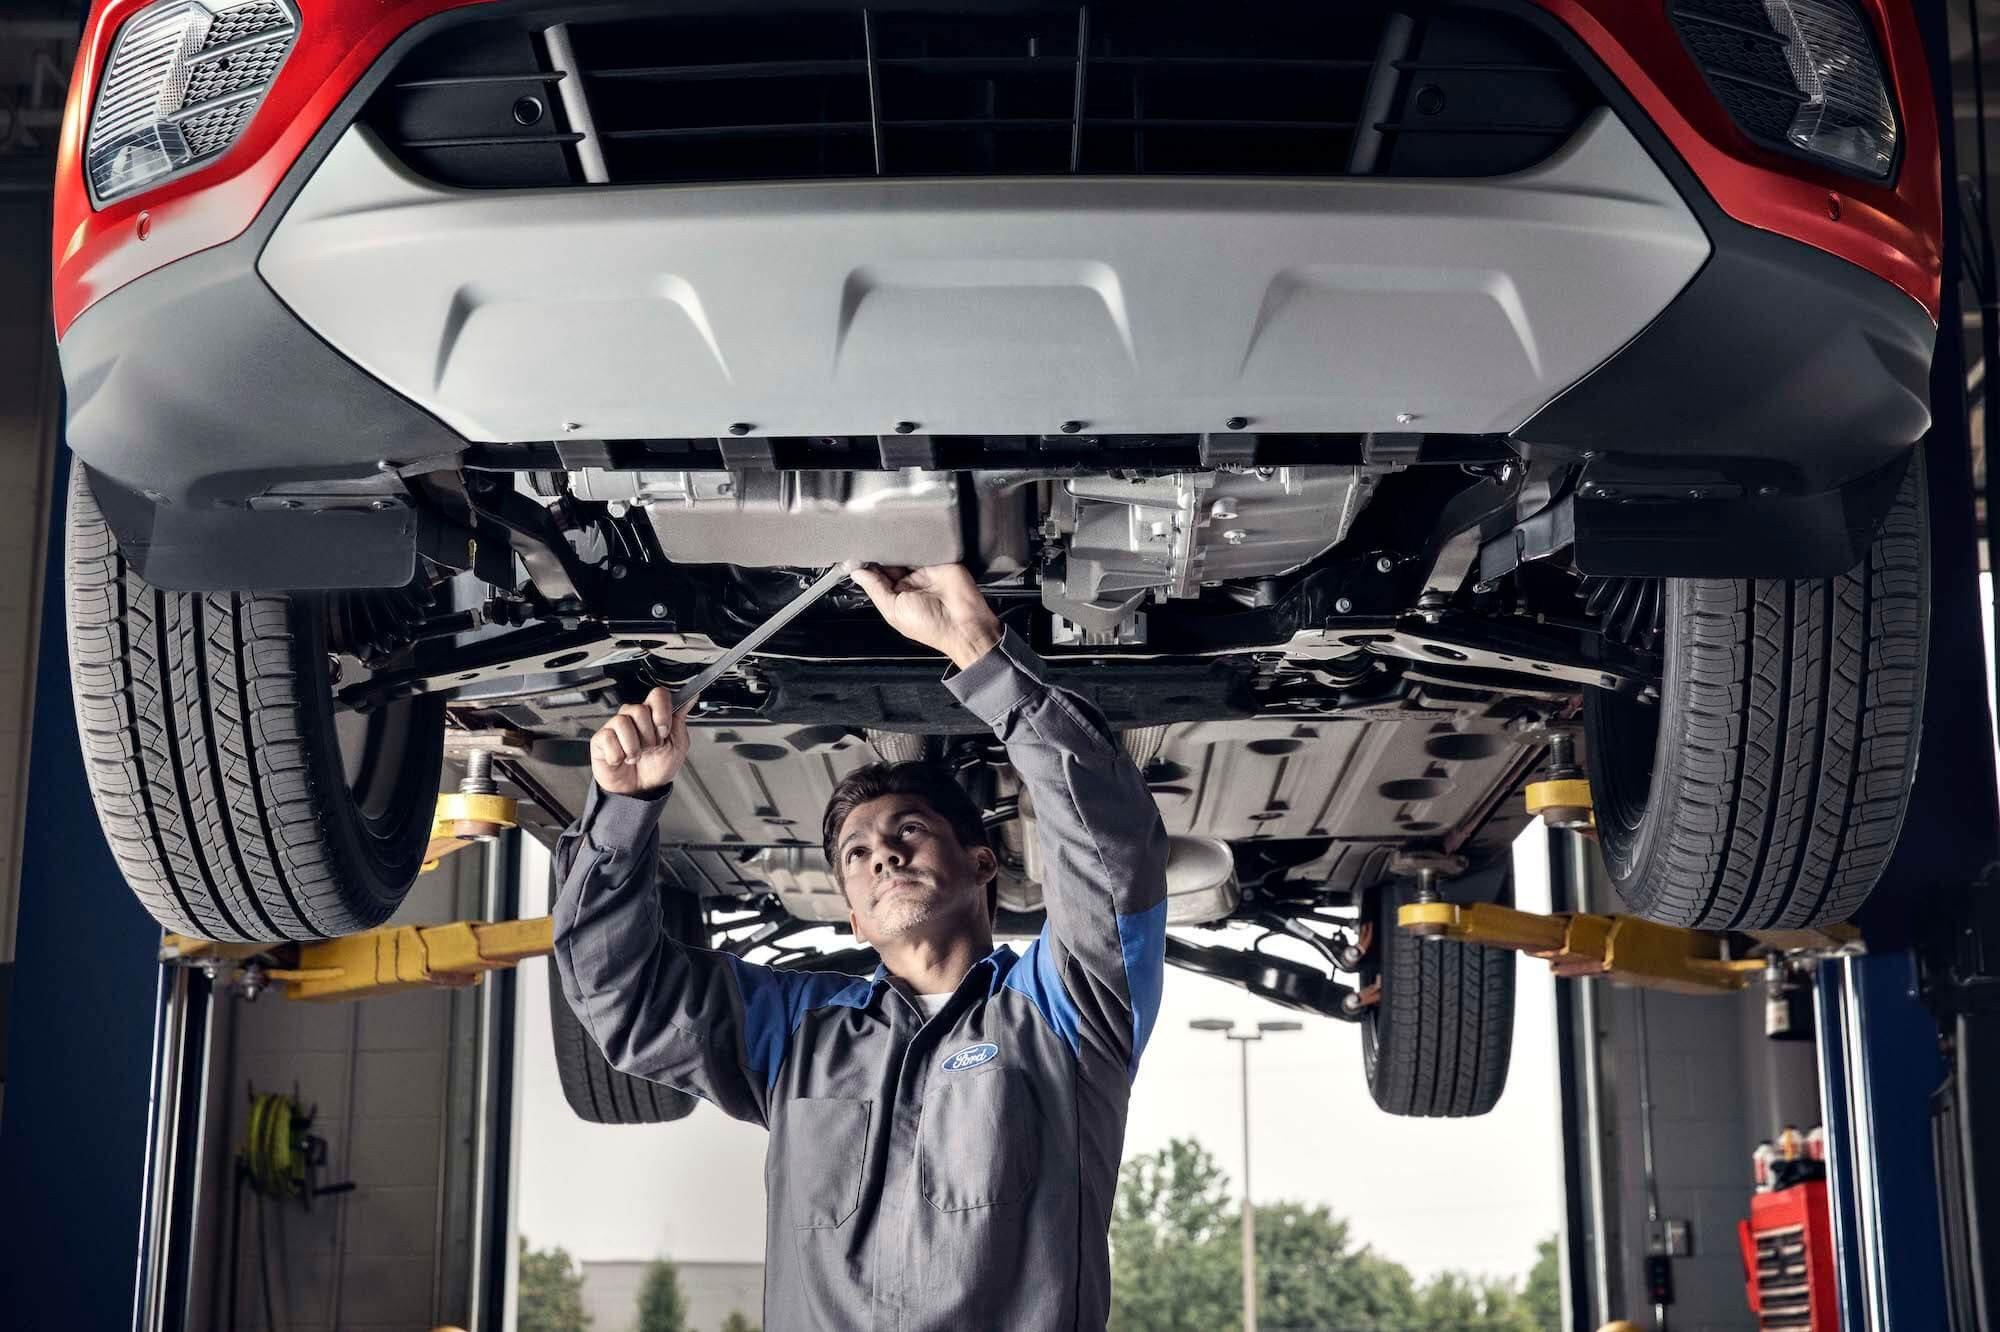 Quick Lane - Service Technician Inspecting Vehicle on Lift